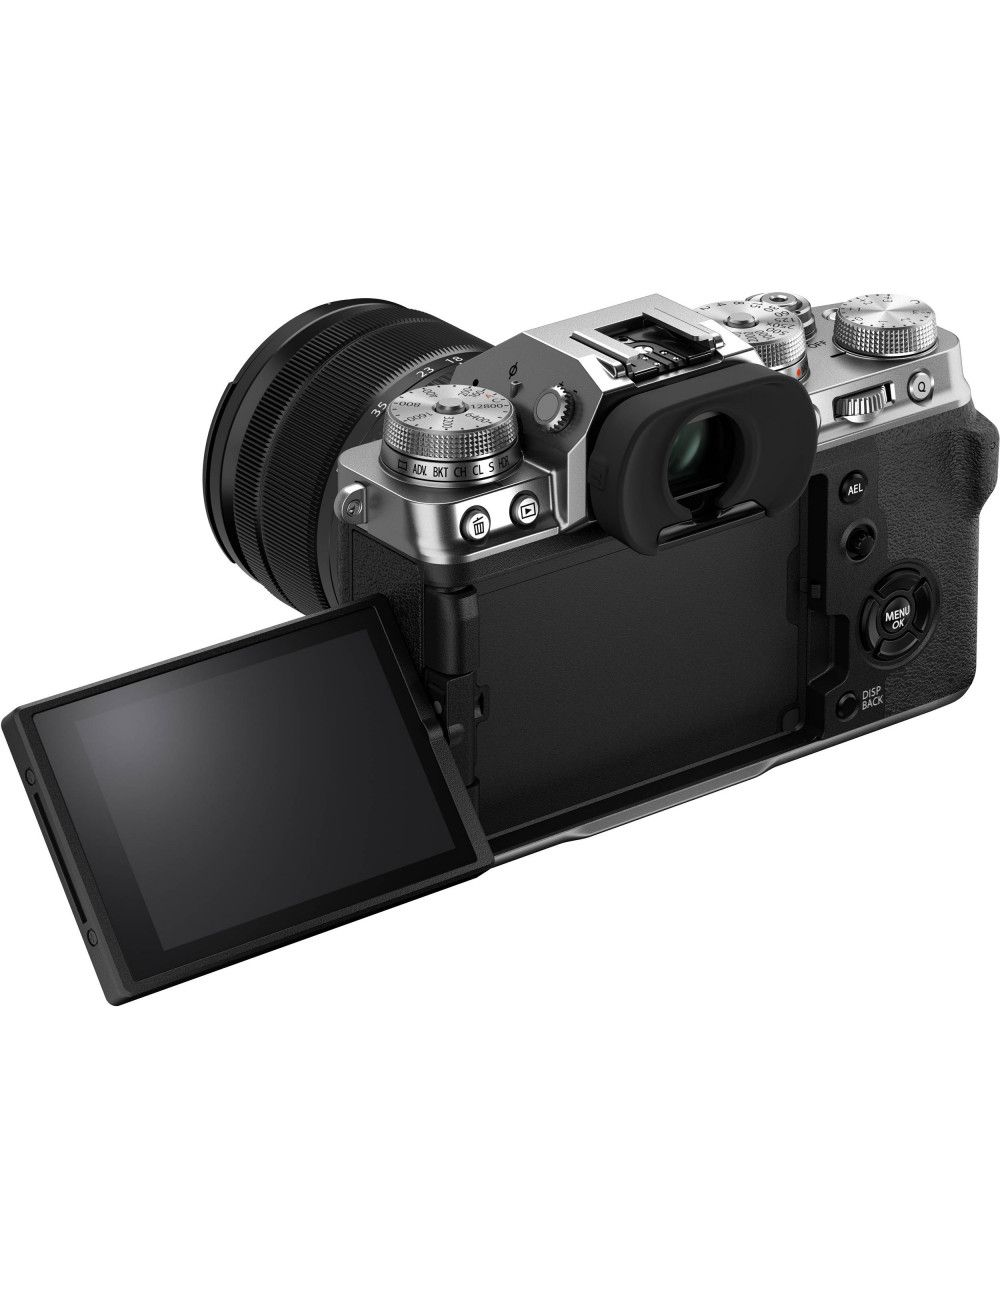 Lente Tamron 18-400mm f/3.5-6.3 Di II VC HLD para Nikon F